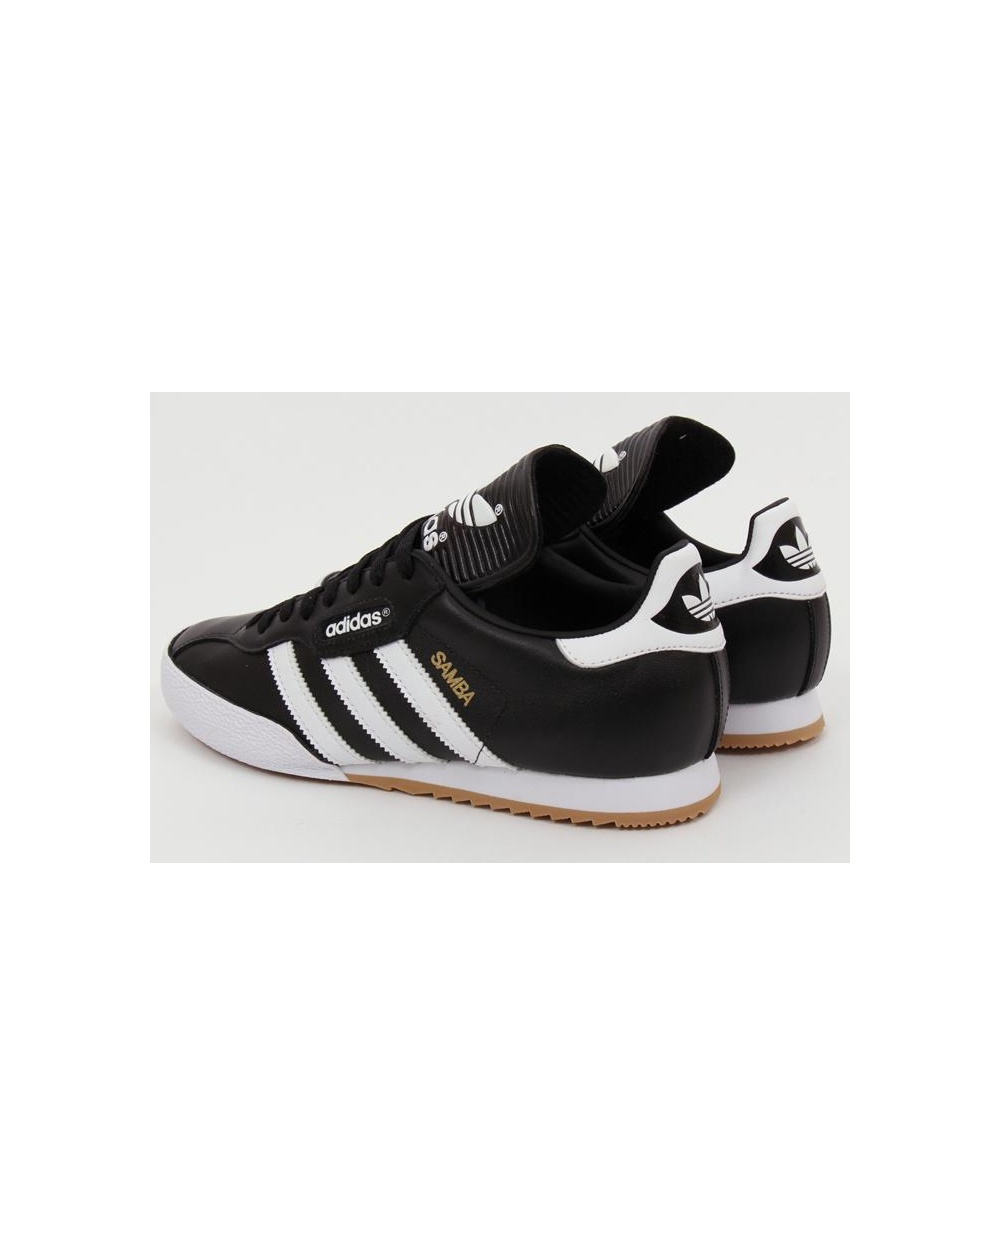 29454d4f1 italy adidas samba super trainers black white 101e6 d6ee0